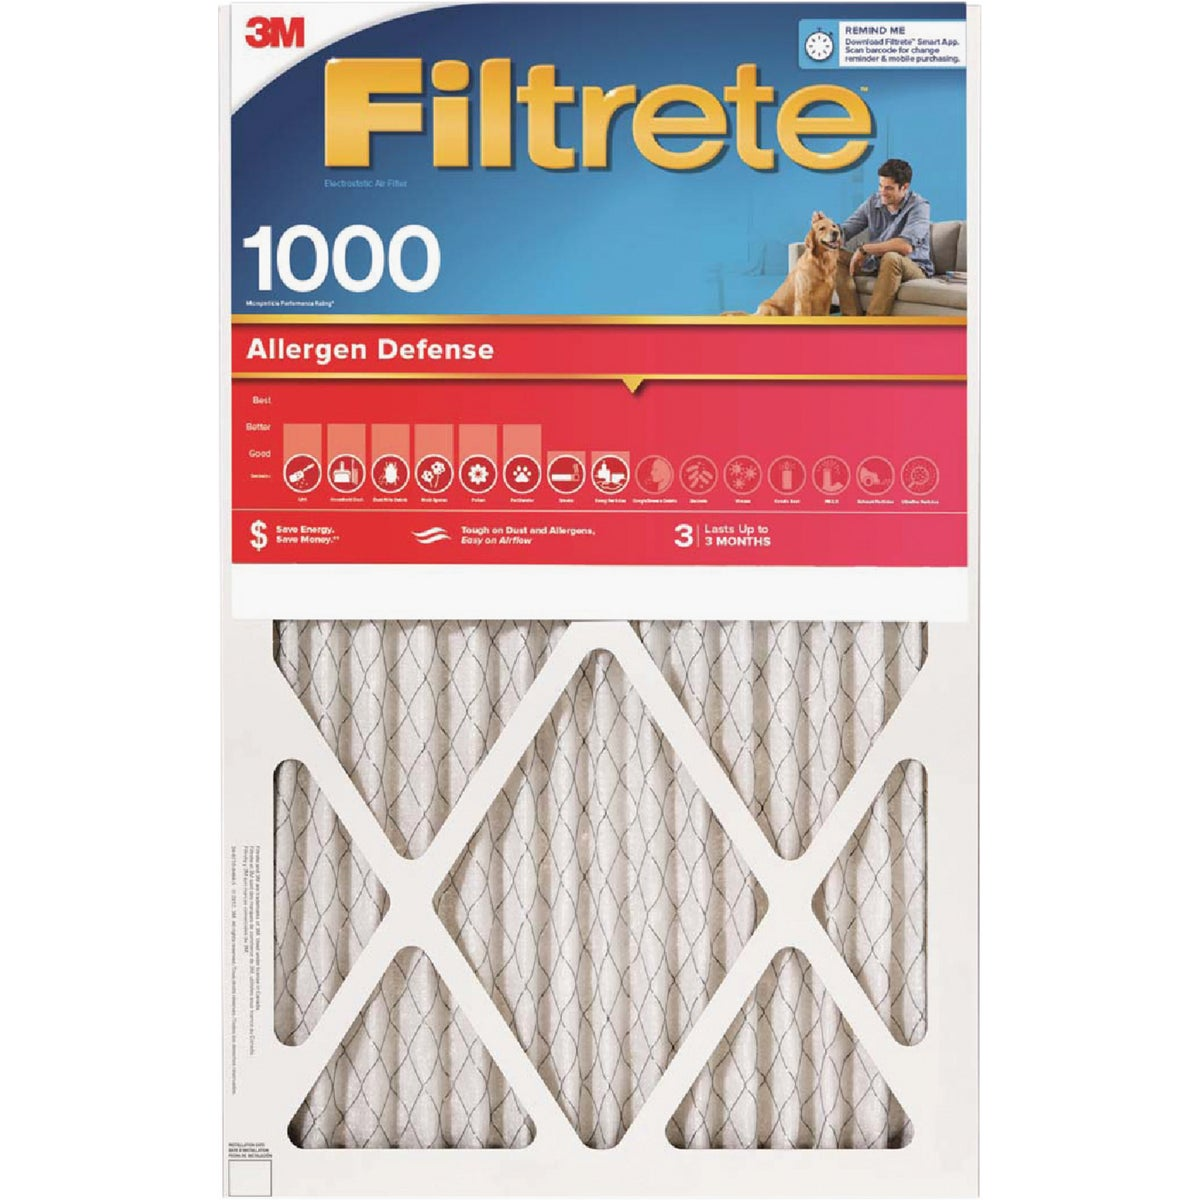 3M Filtrete 12 In. x 20 In. x 1 In. Allergen Defense 1000/1085 MPR Furnace Filter